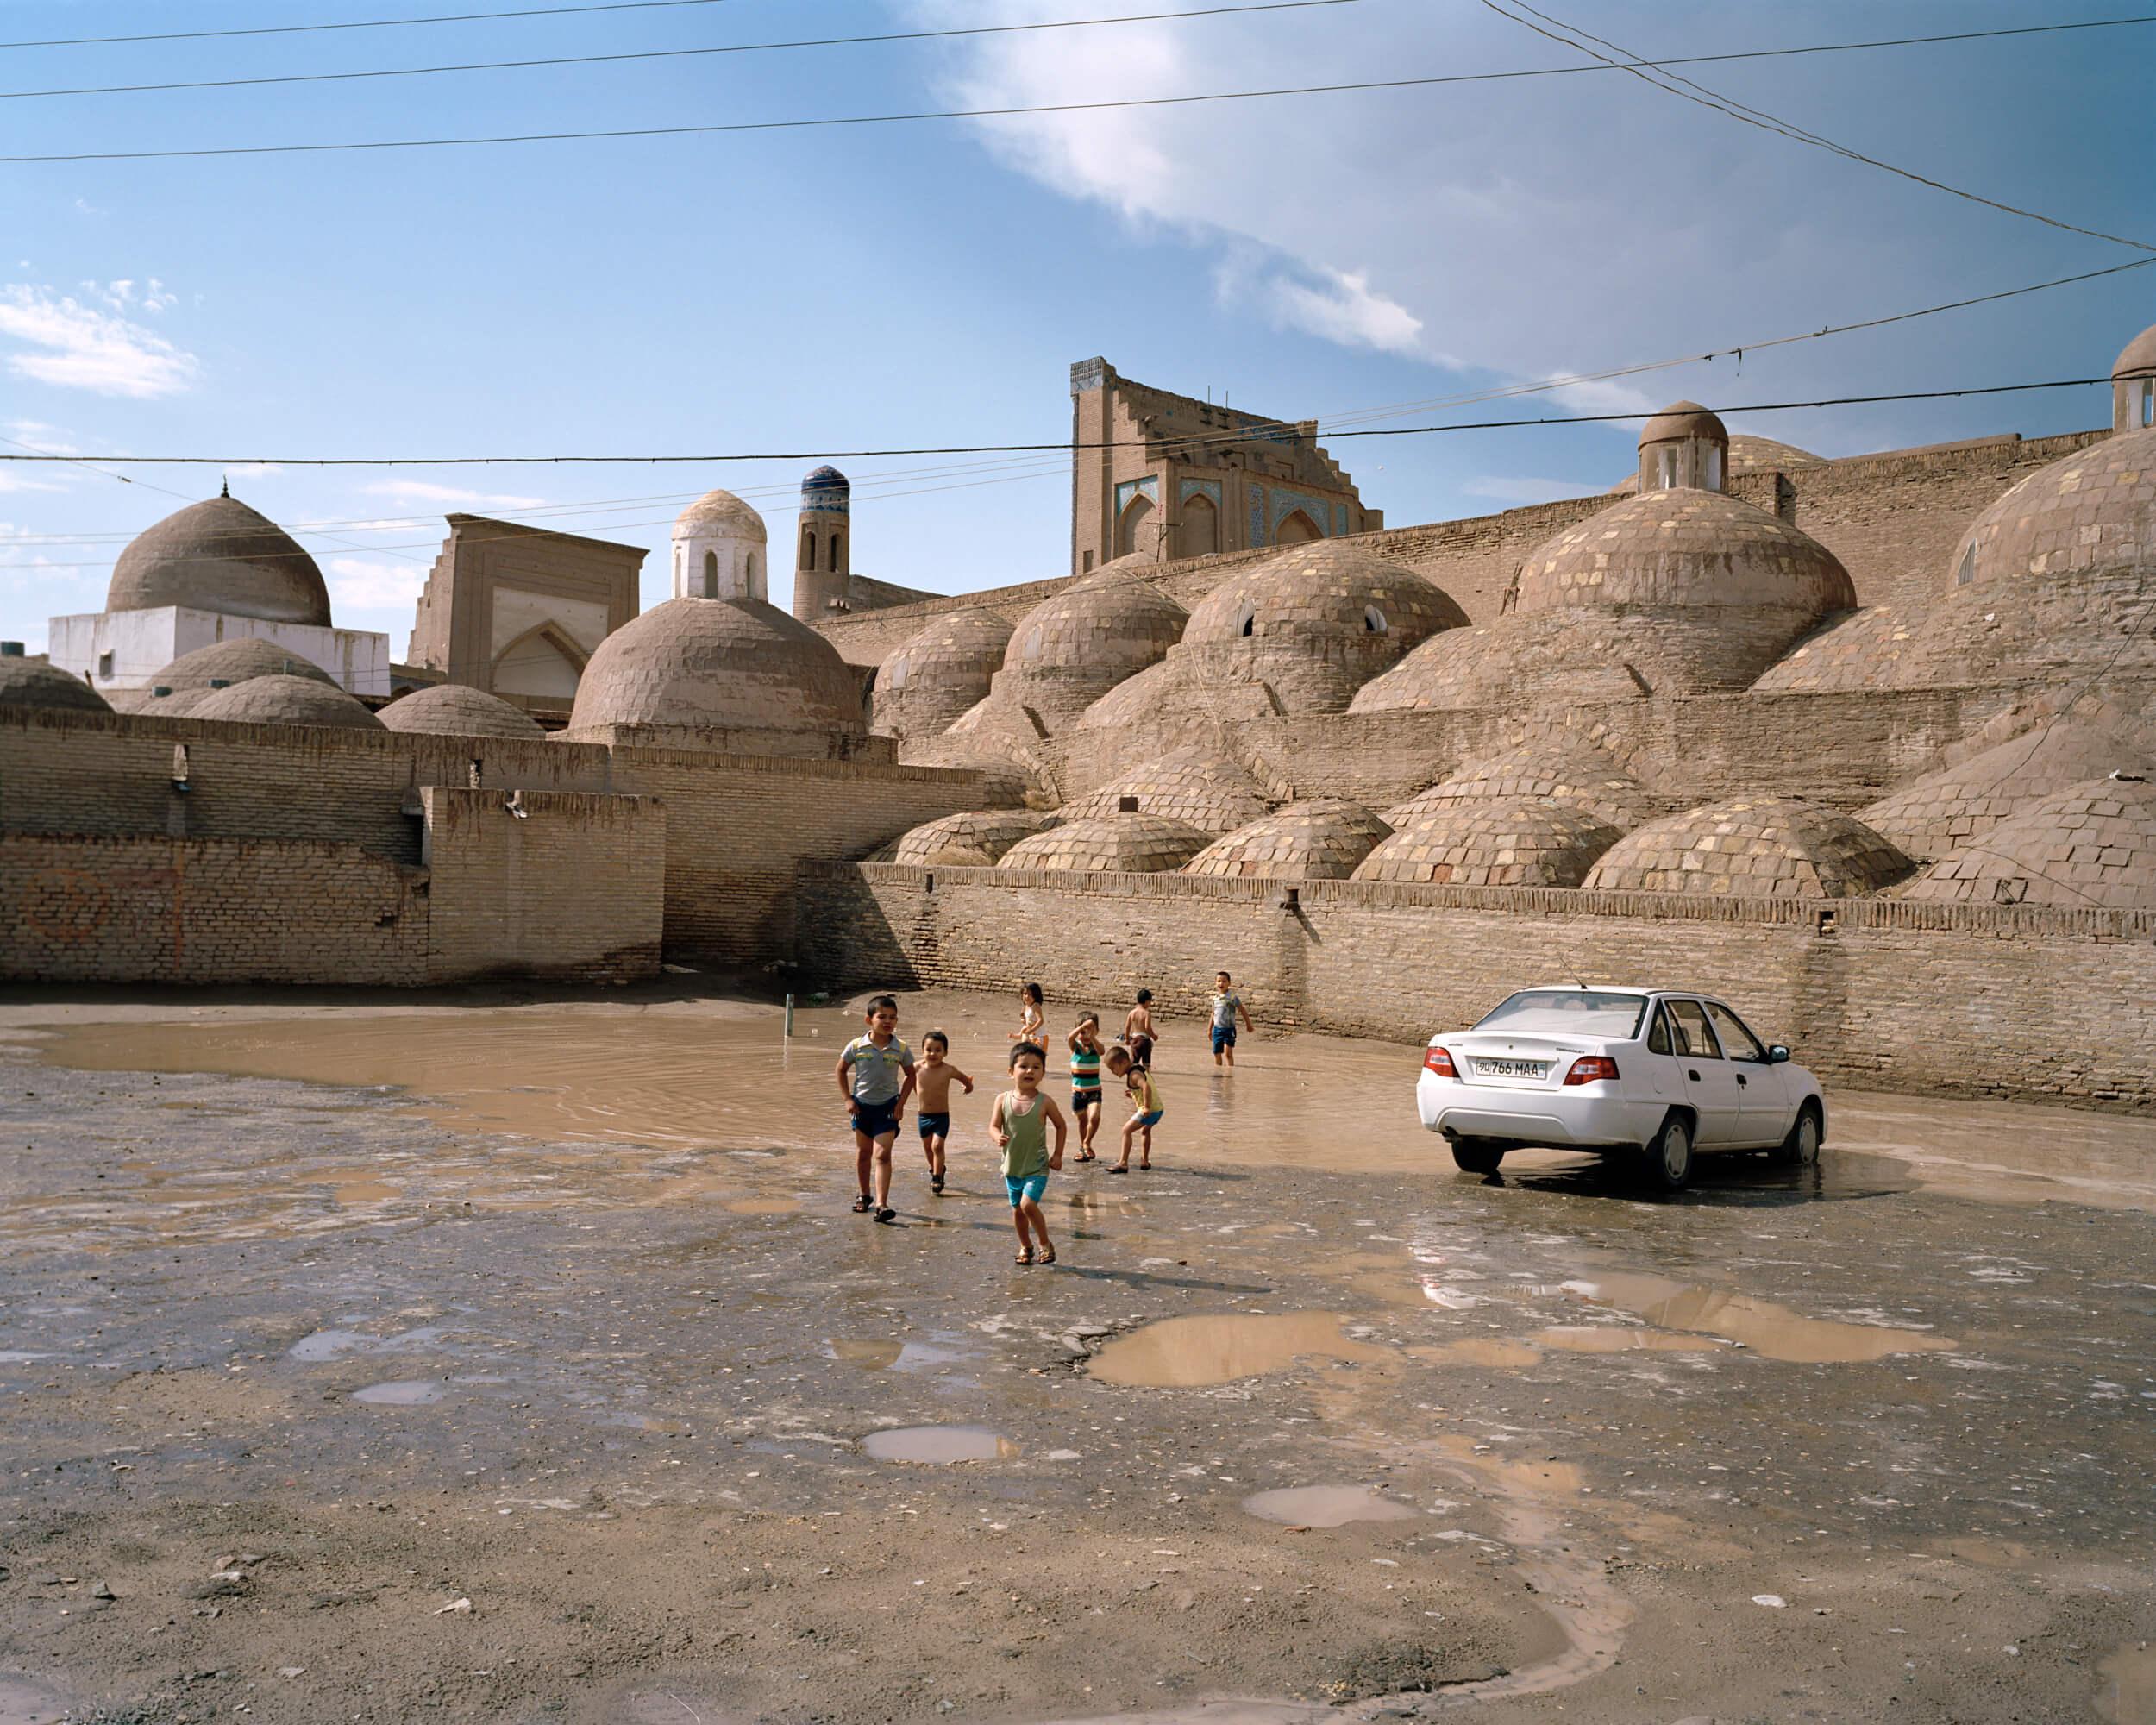 marco-barbieri-water-in-the-desert-34.jpg